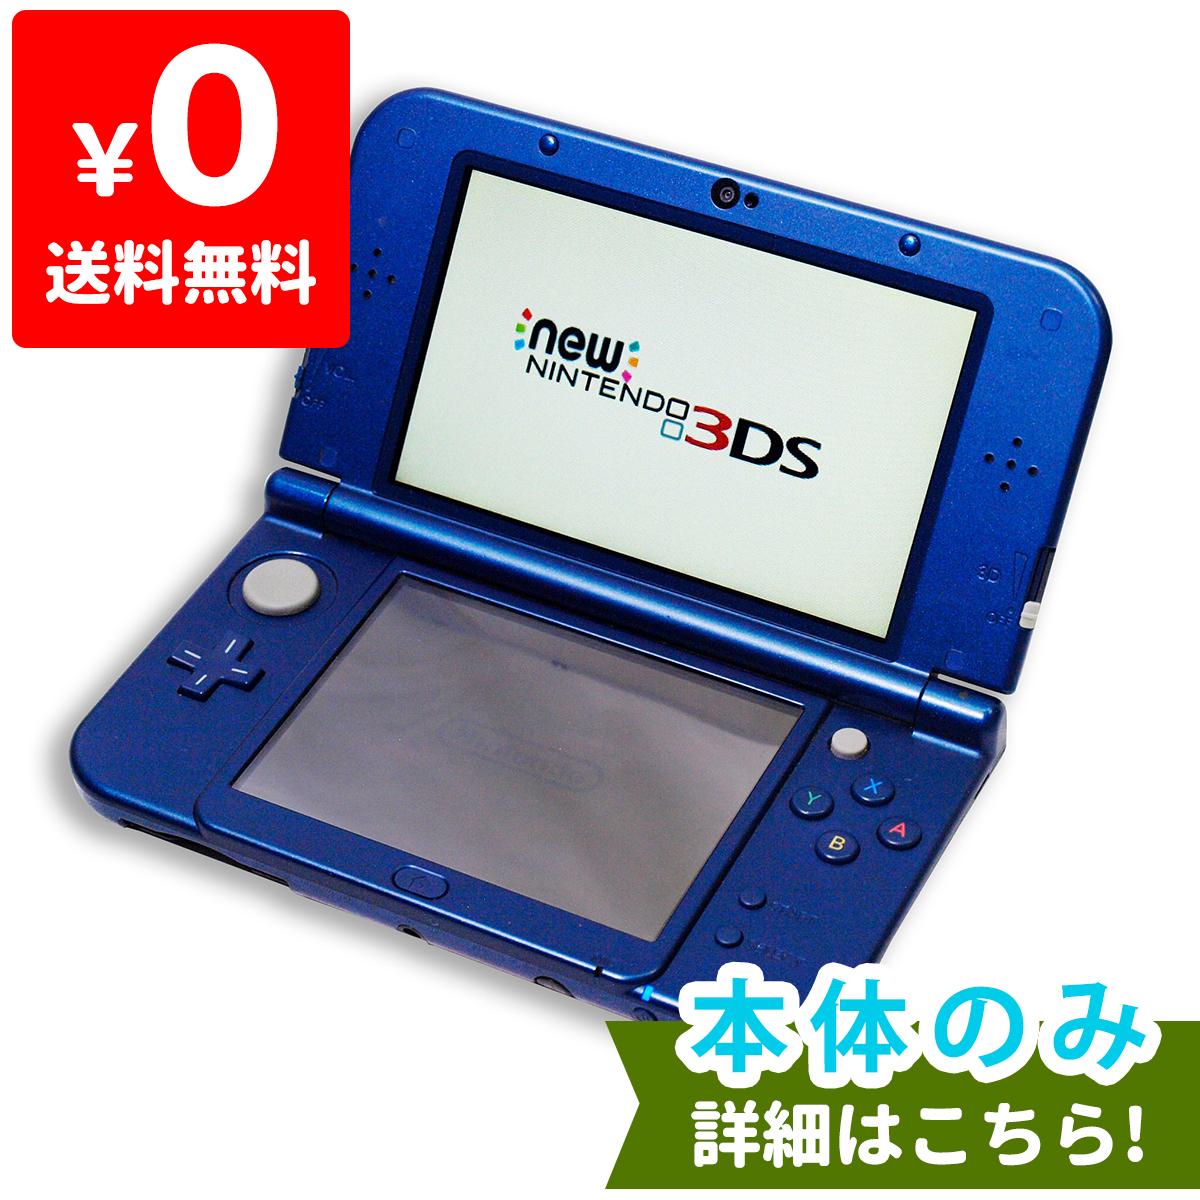 New3DSLL New ニンテンドー3DS LL メタリックブルー(RED-S-BAAA) 本体のみ タッチペン付き Nintendo 任天堂 ニンテンドー 4902370522174 【中古】